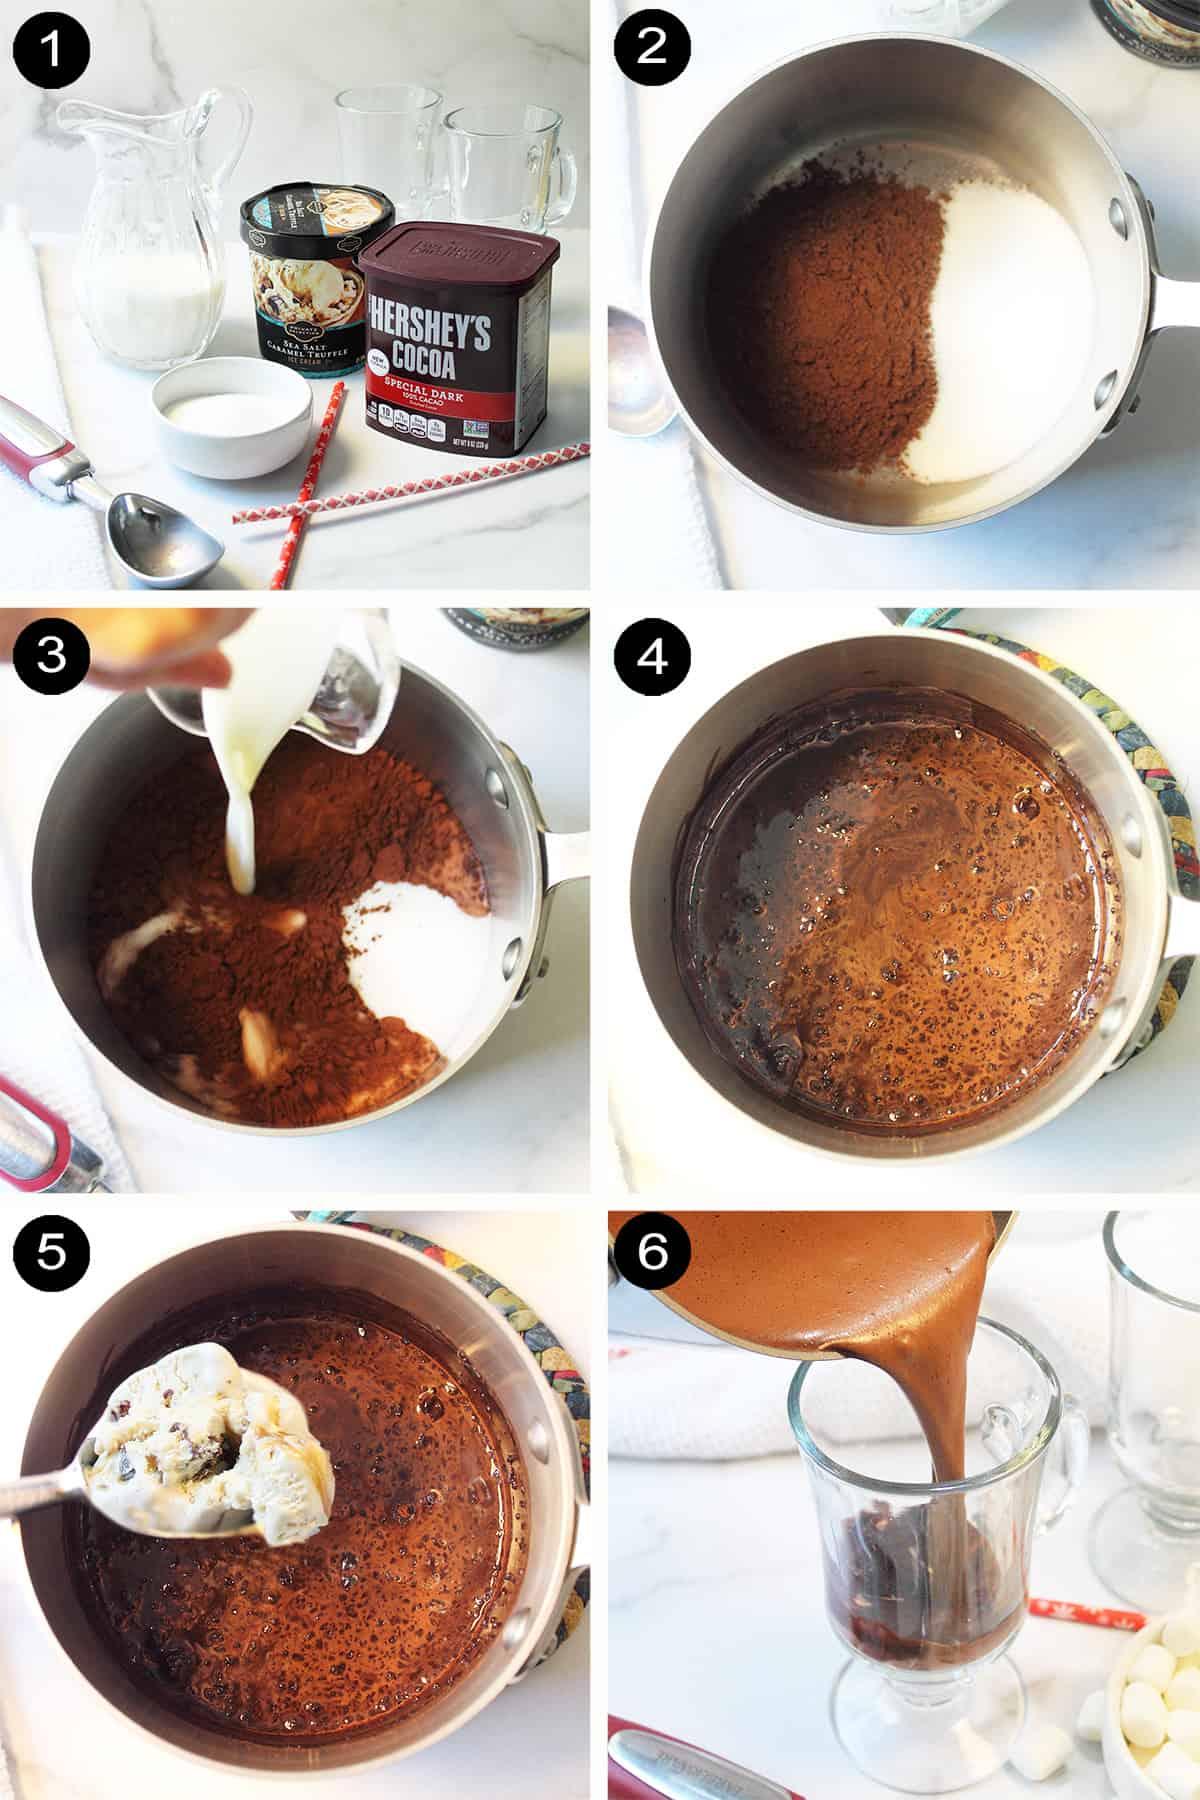 Prep steps to make salted caramel hot chocolate.